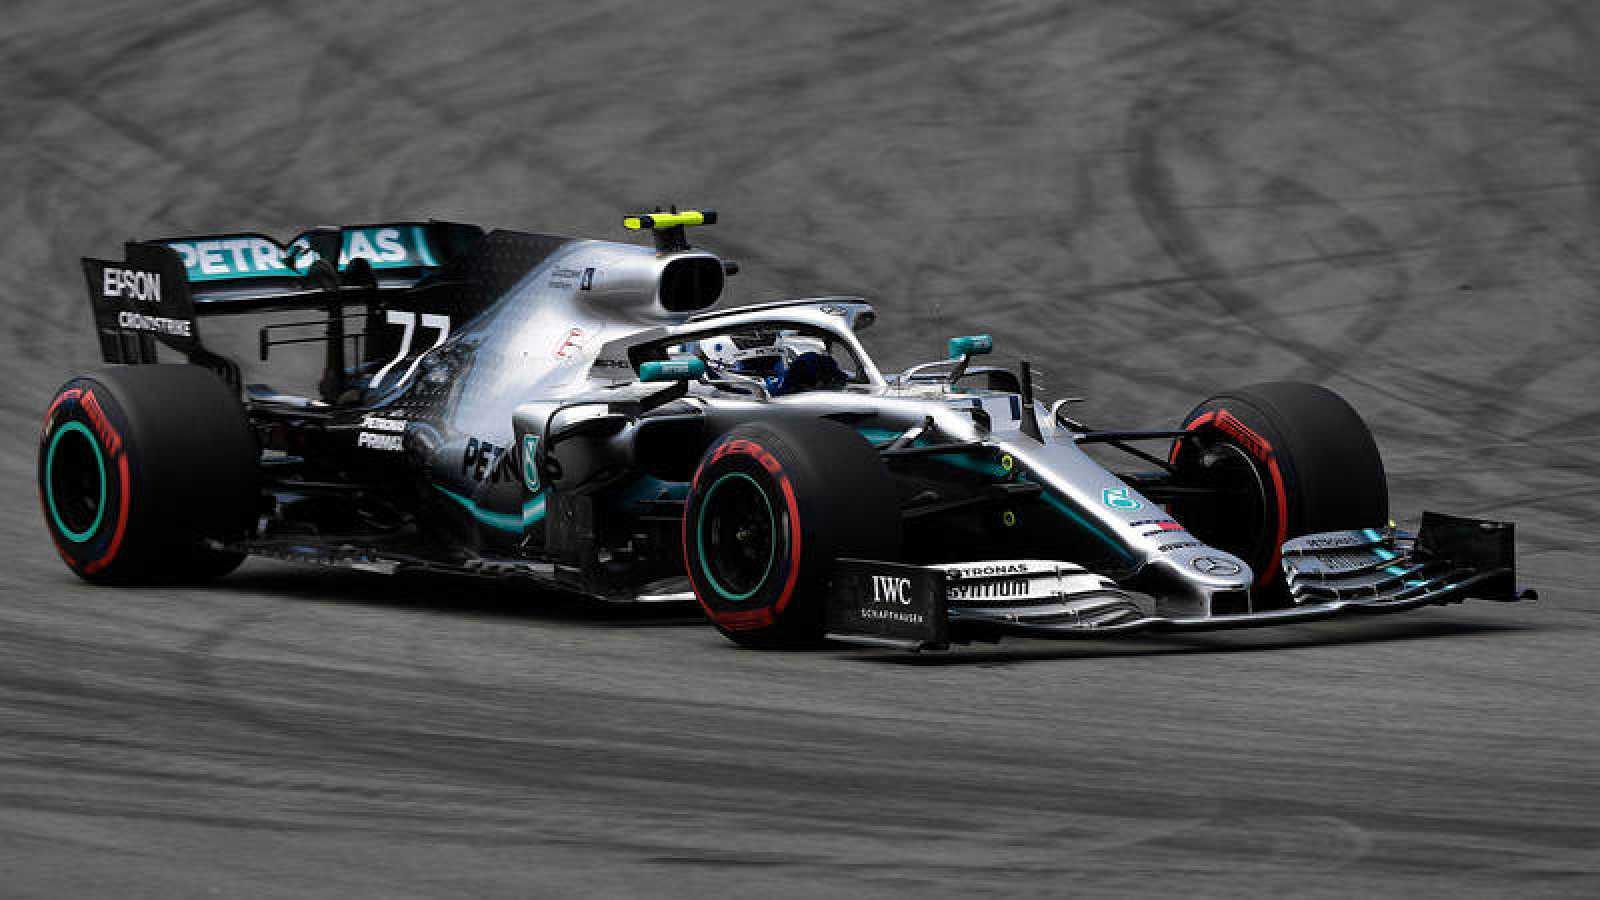 Bottas castiga a Hamilton; gana la 'pole' para GP de España